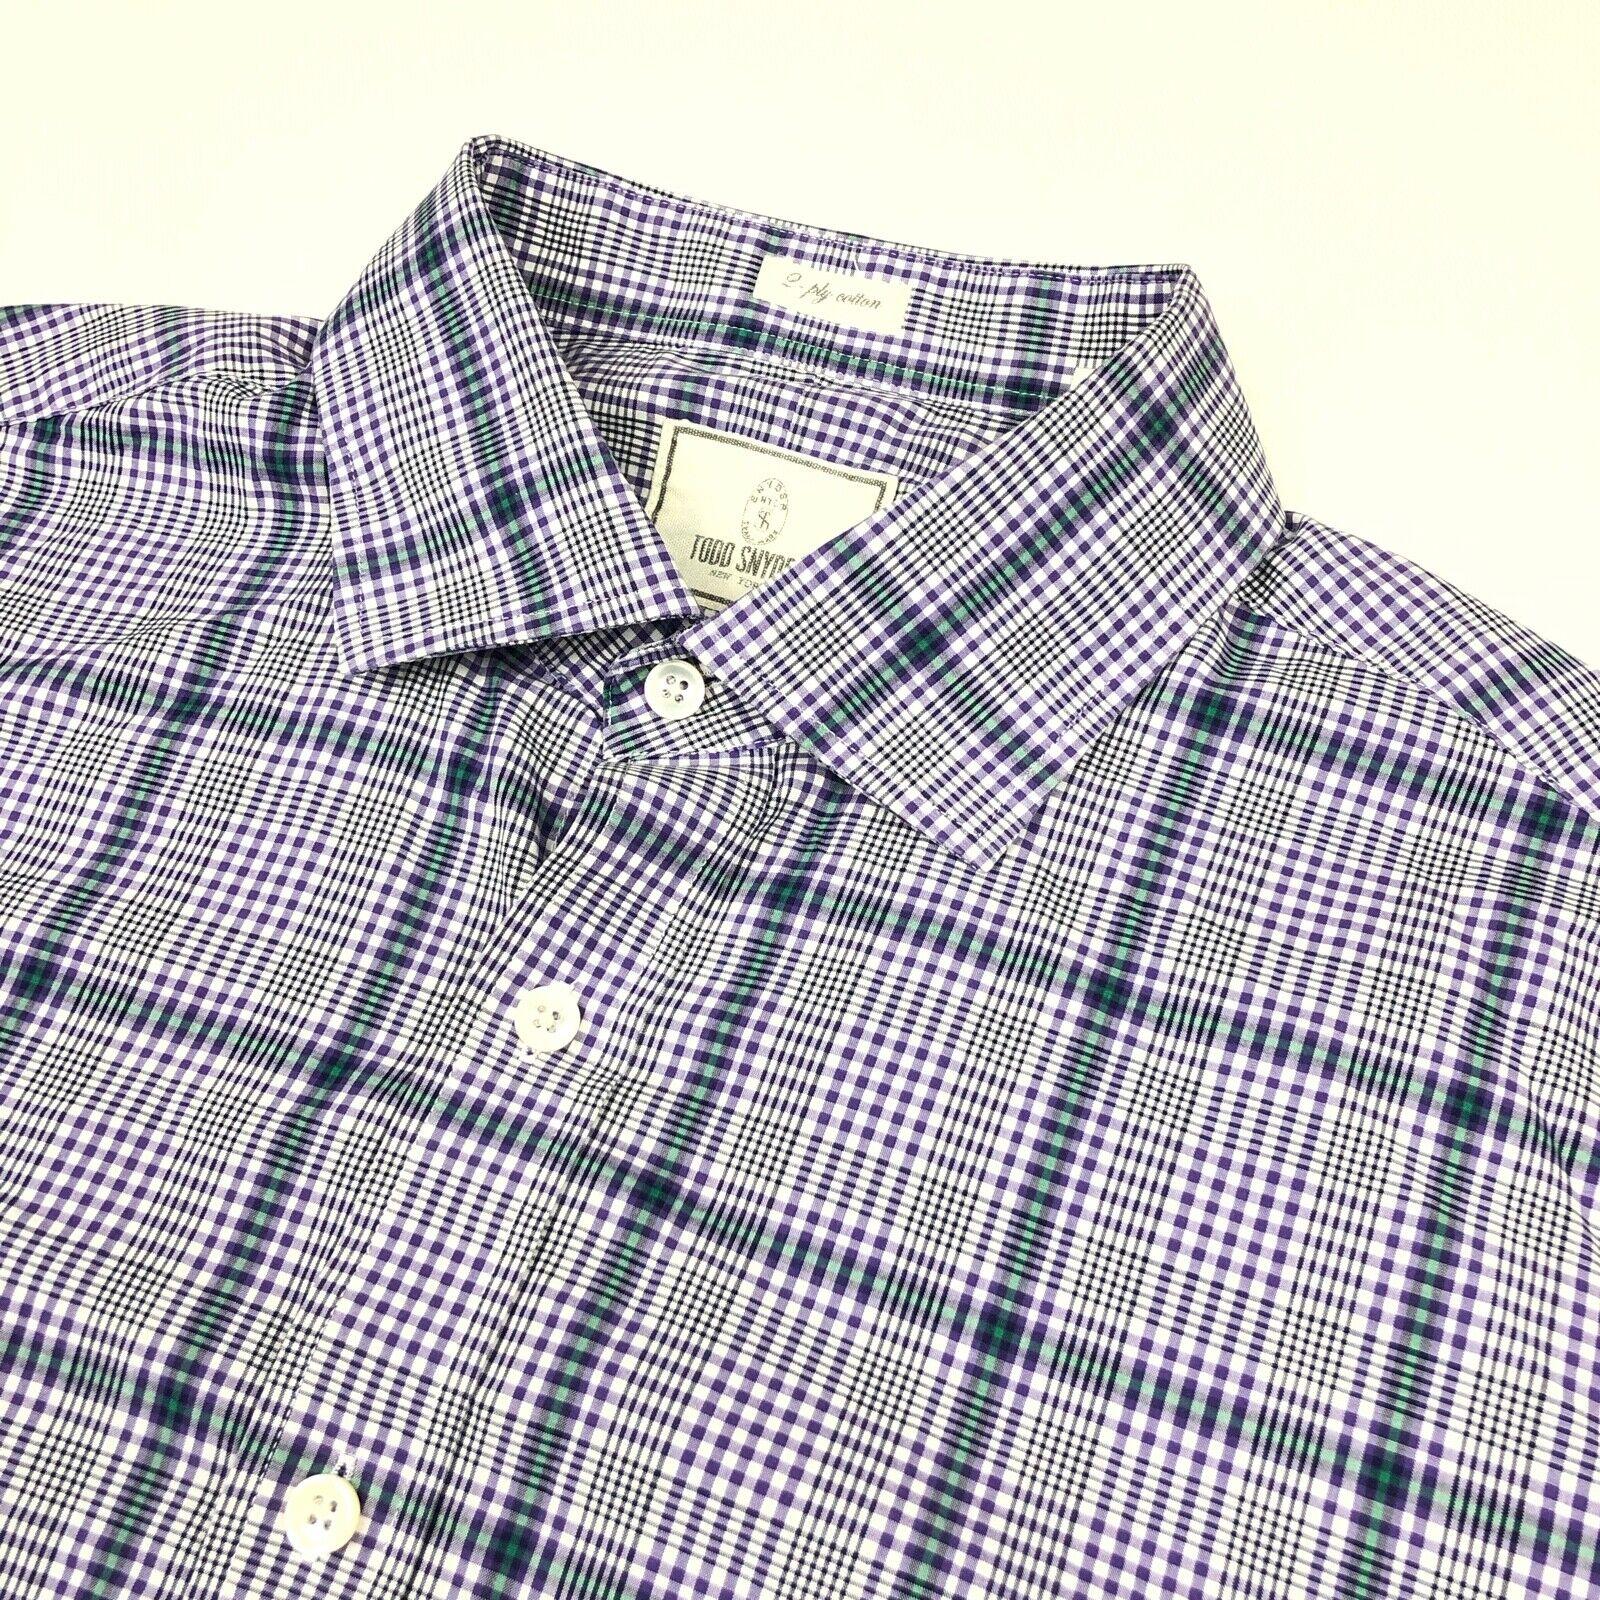 9368b0d2 TODD SNYDER New York Men's Button Shirt Purple • Size 17.5 35 Plaid ...